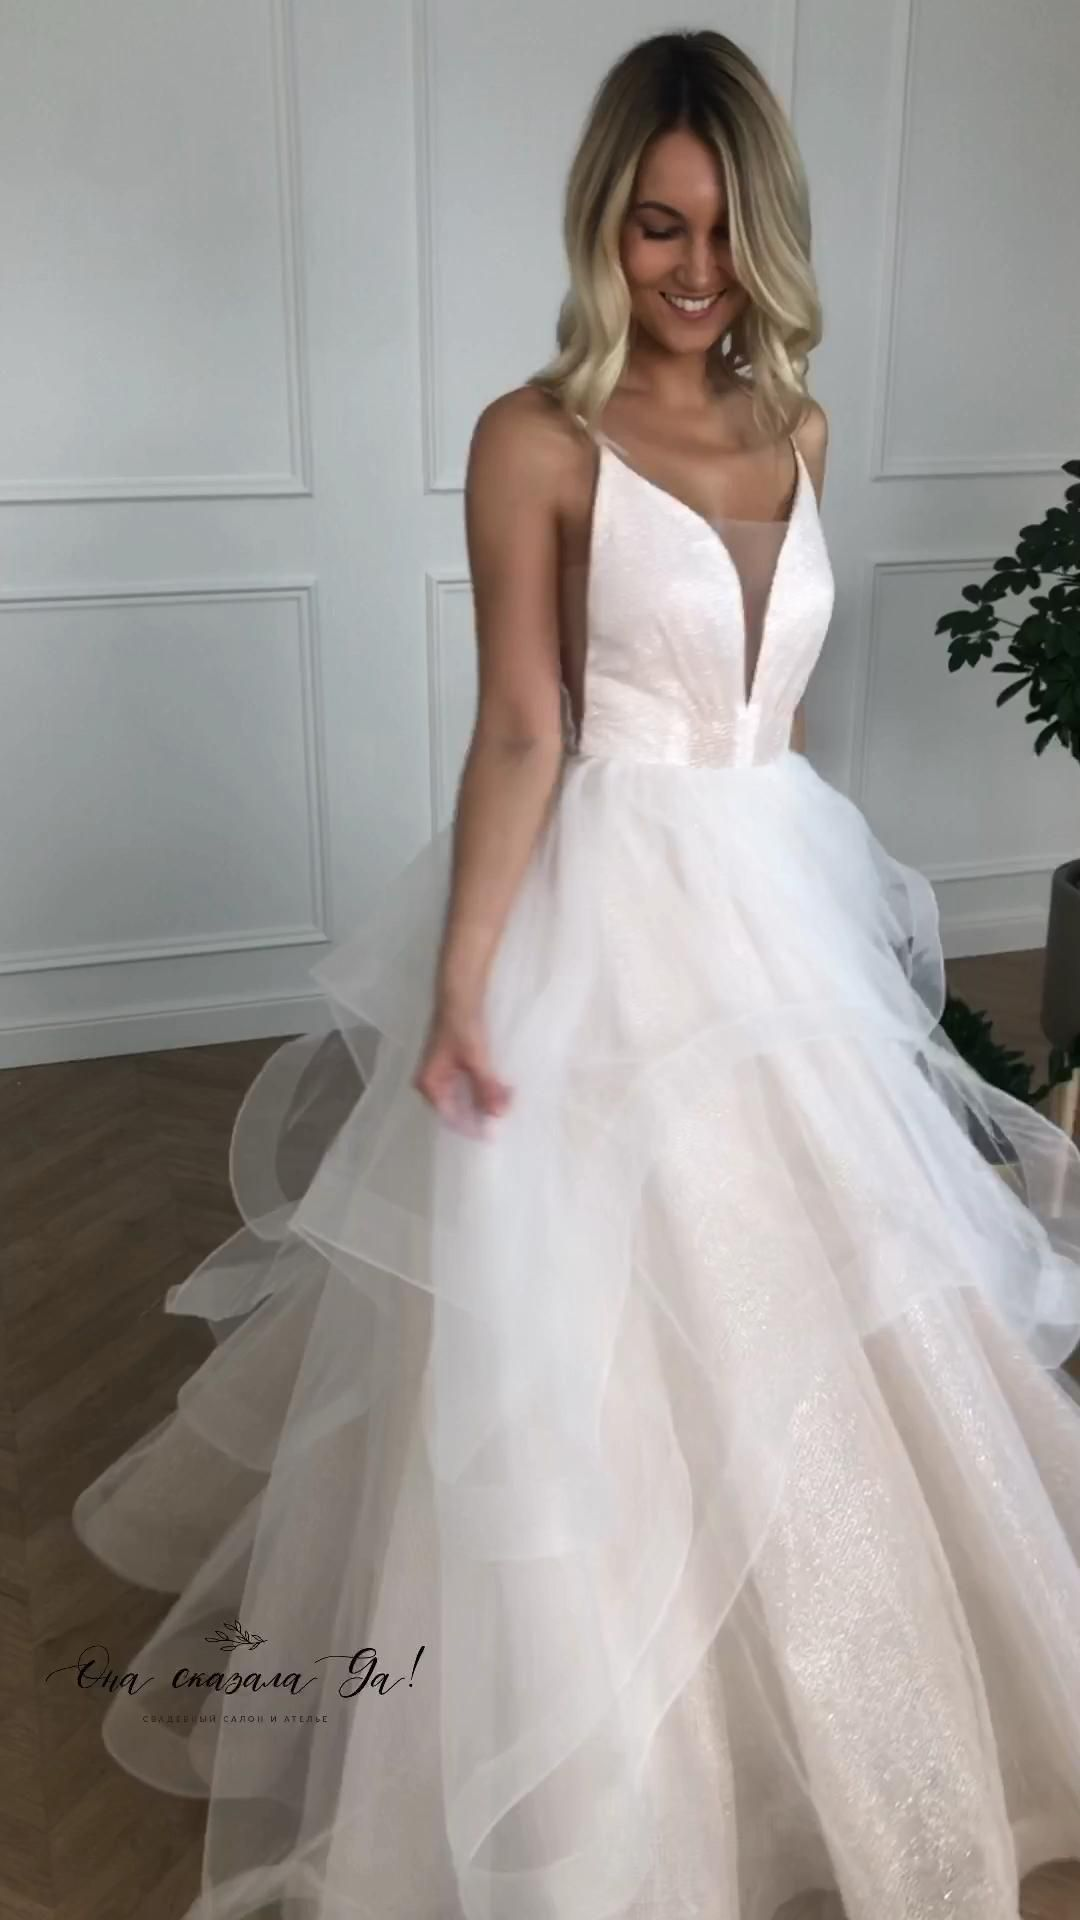 Wedding Dresses Wedding Gowns 2020 Prom Night Dress Venues